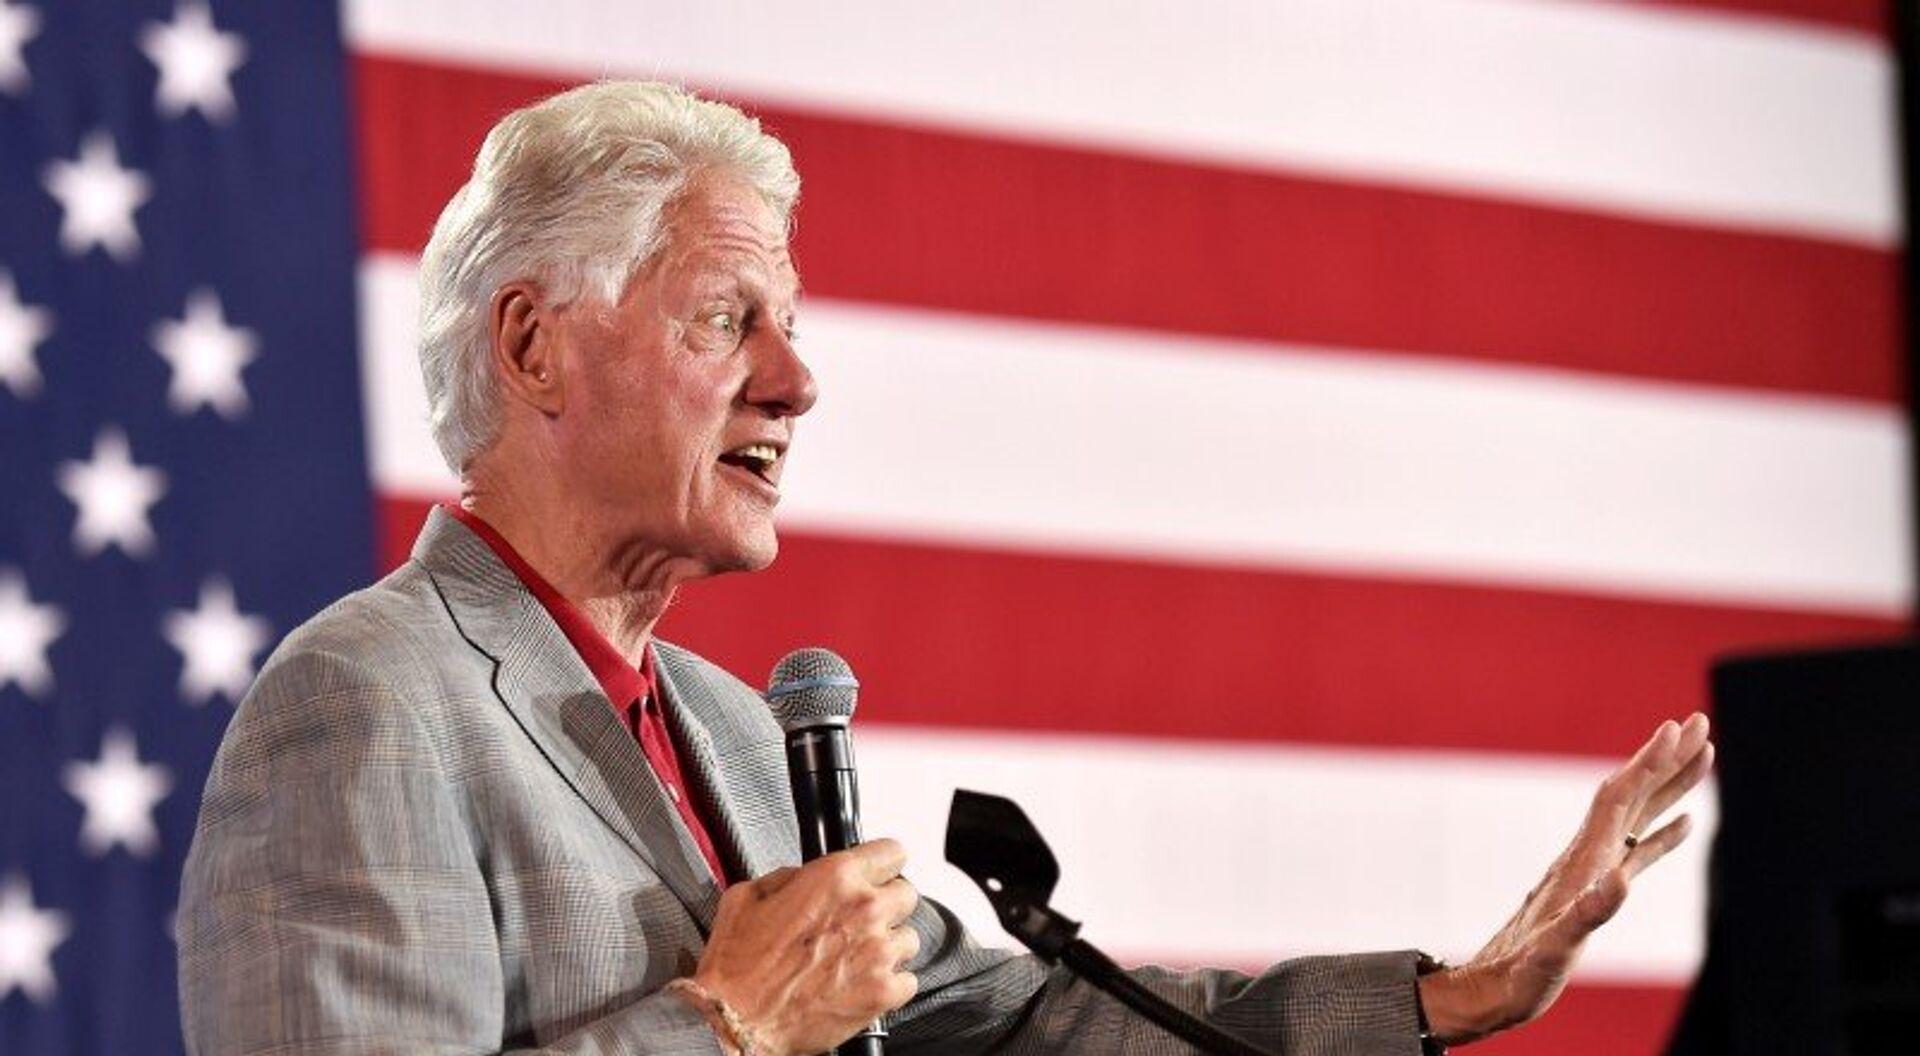 Бивши председник САД Бил Клинтон - Sputnik Србија, 1920, 10.06.2019